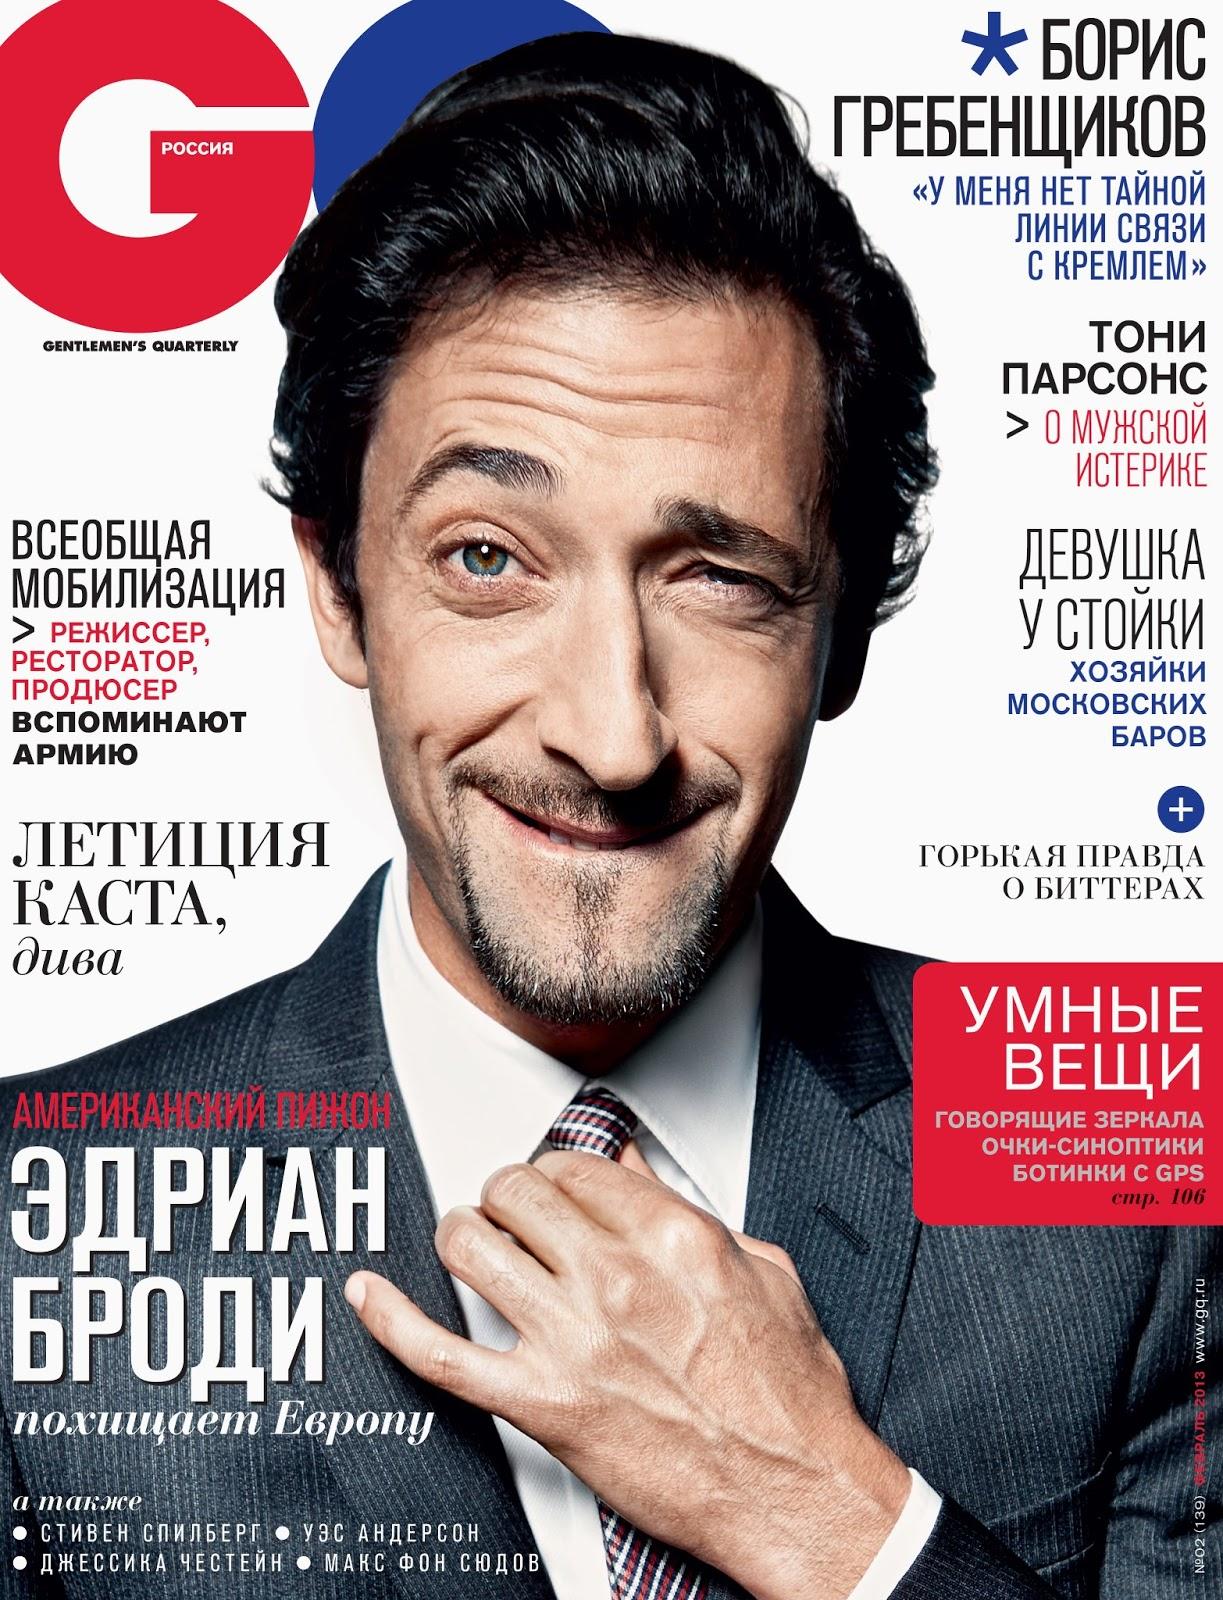 http://3.bp.blogspot.com/-zaGLuoJlovc/USGUHuG_YKI/AAAAAAABIOI/GPhNXJGaEvU/s1600/GQ-Russia-February-2013-Adrien-Brody-Cover.jpg